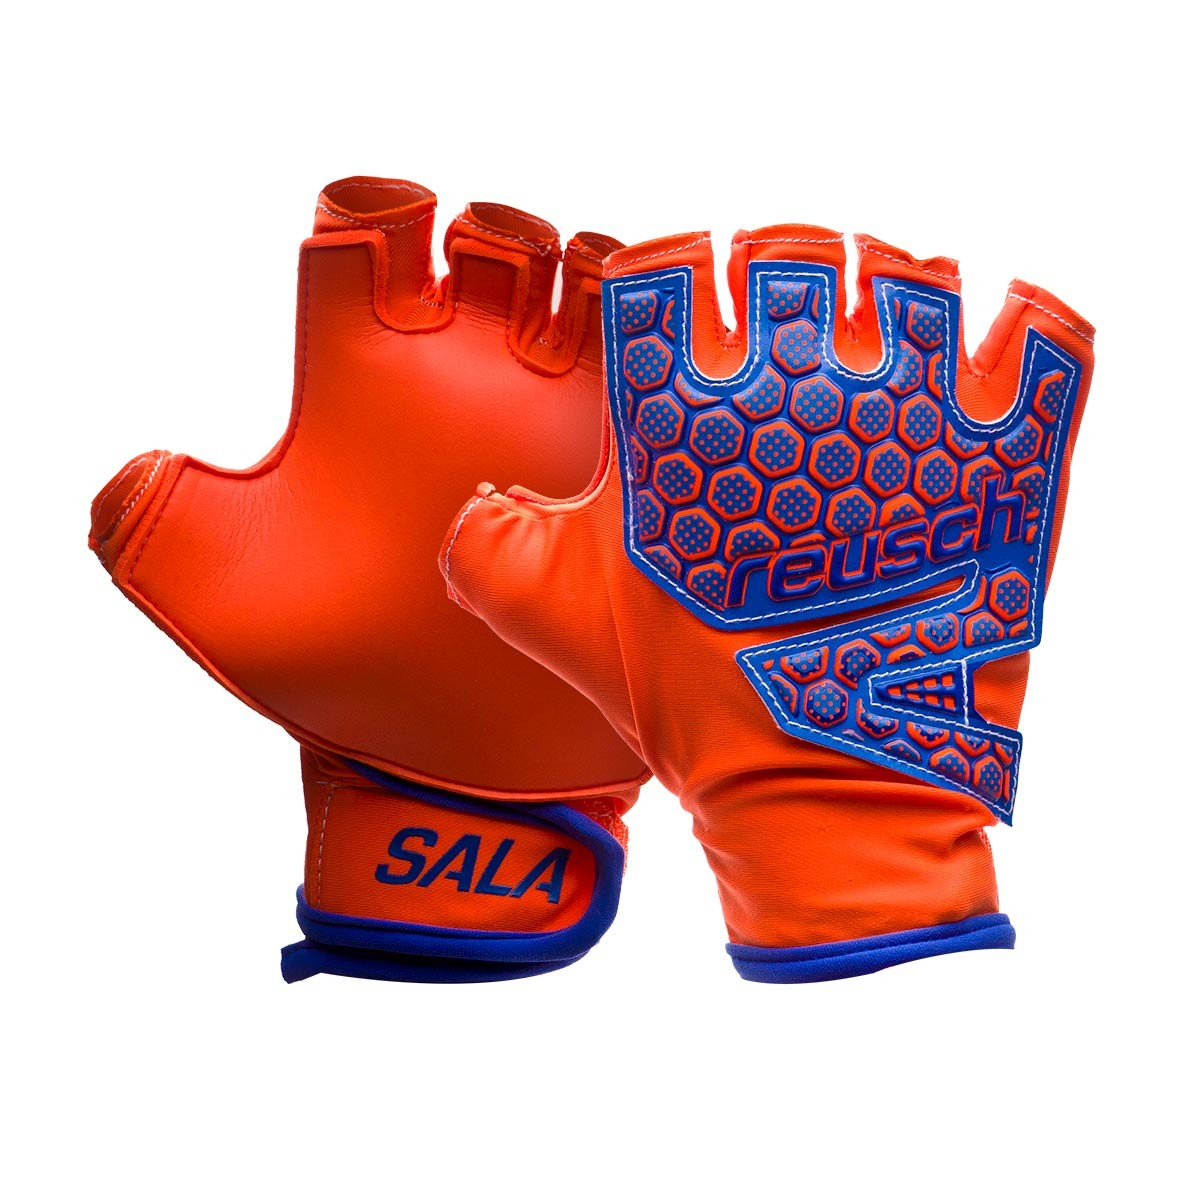 09a9f0eee8ac Glove Reusch Reusch Futsal SG SFX Shocking orange-Blue-Shocking ...